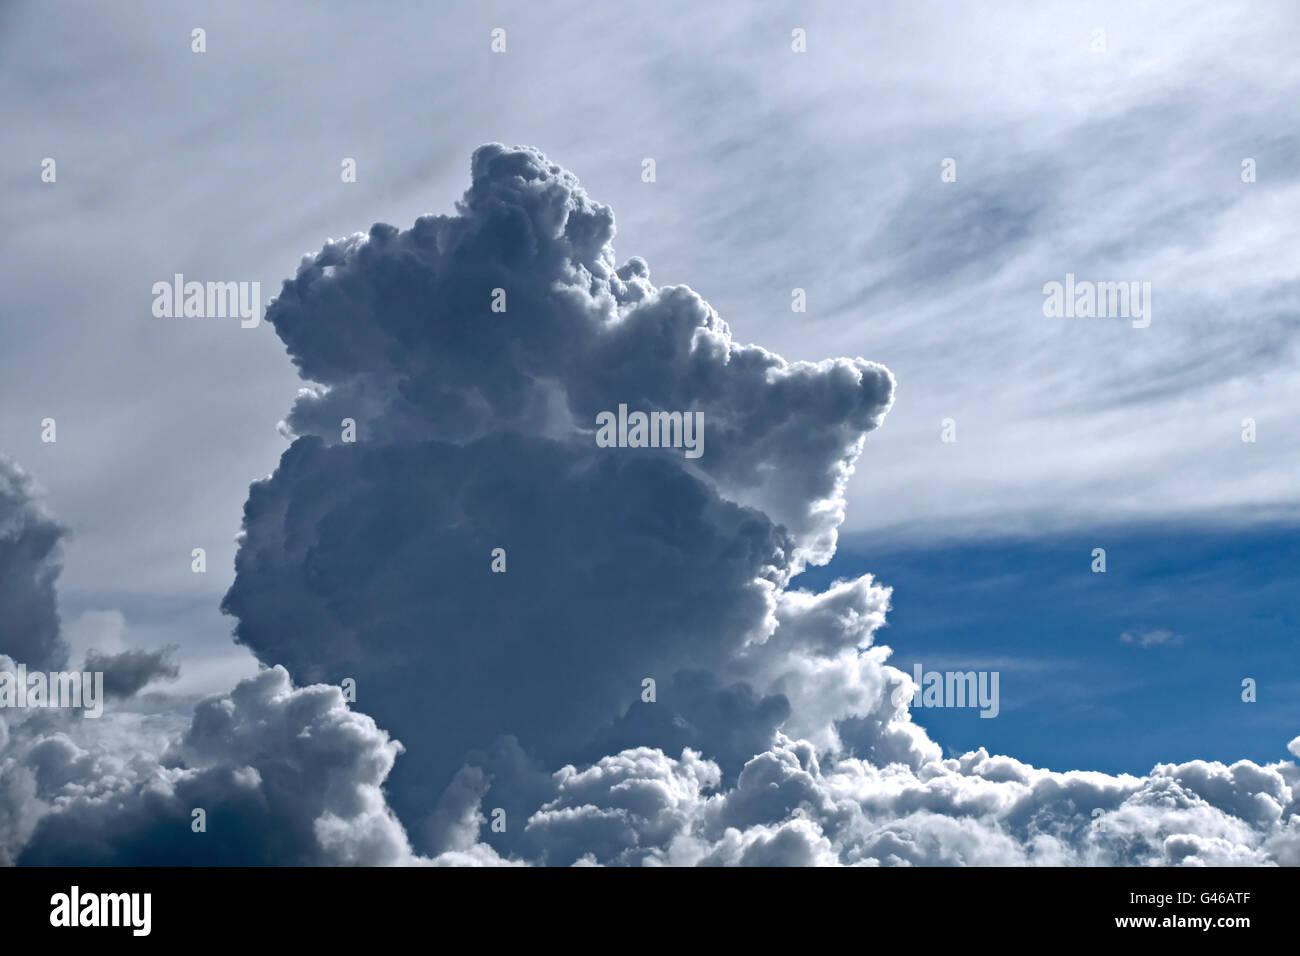 Cumulonimbus thunderhead Clouds, Upper Bavaria, Germany, Europe. - Stock Image